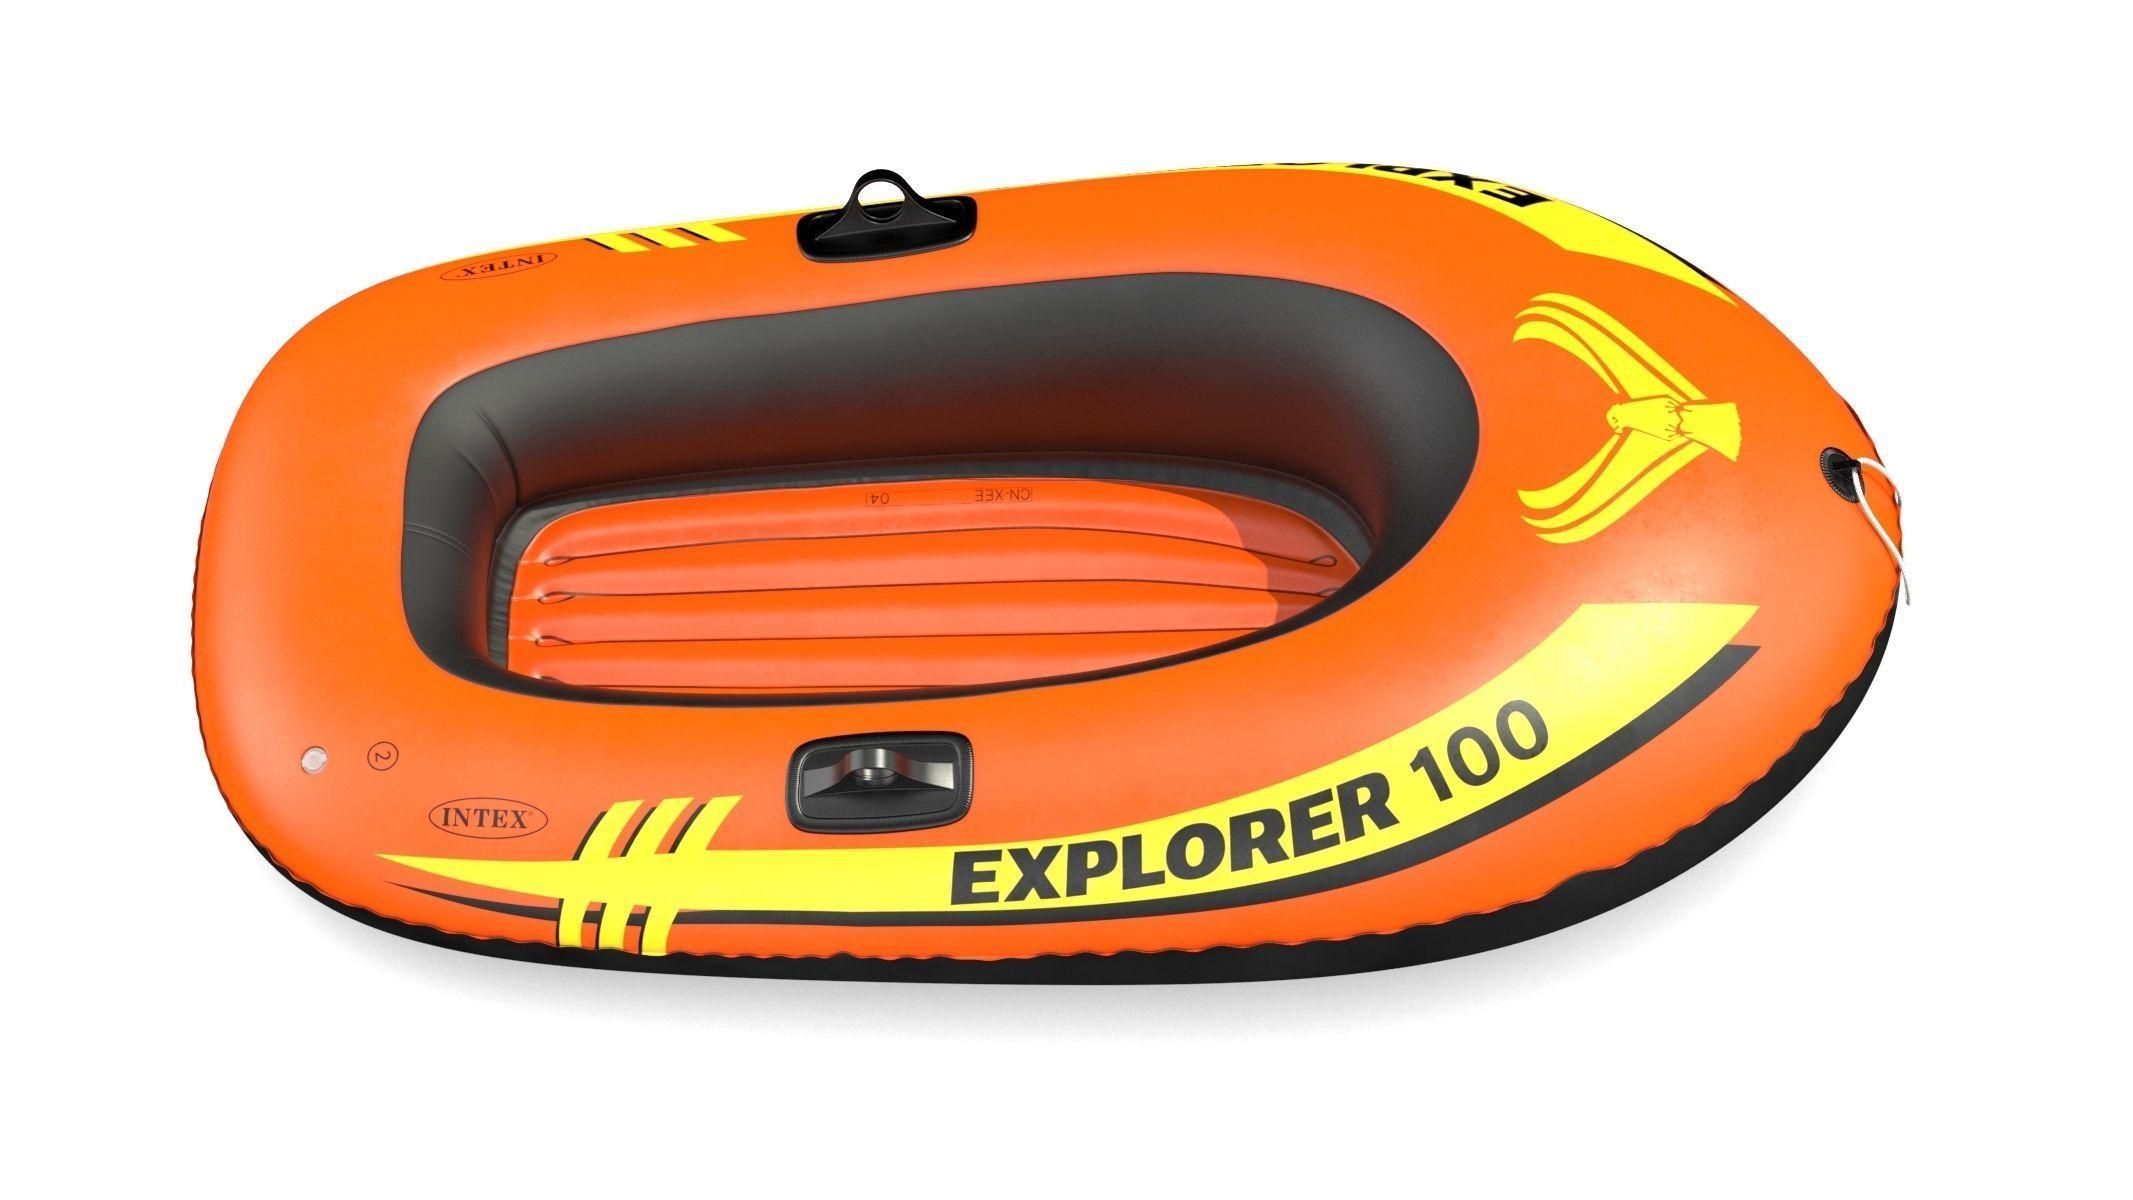 Intex Explorer 100 Inflatable Boat Series